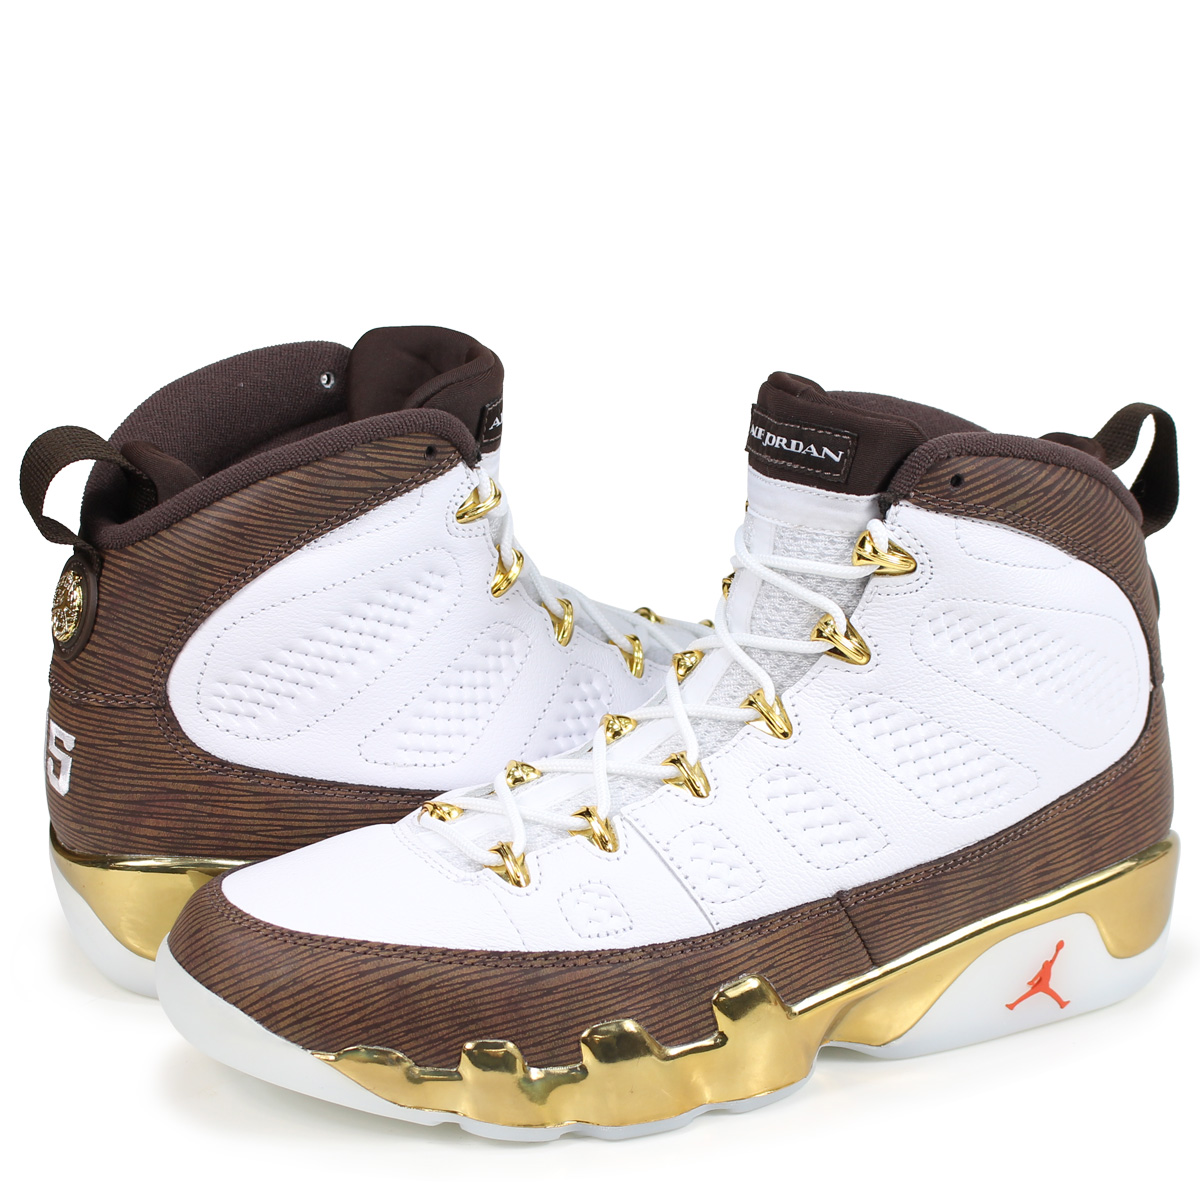 brand new 8a54f 94f1f NIKE AIR JORDAN 9 RETRO MOP MELO Nike Air Jordan 9 nostalgic sneakers men  302,370-122 white [189]